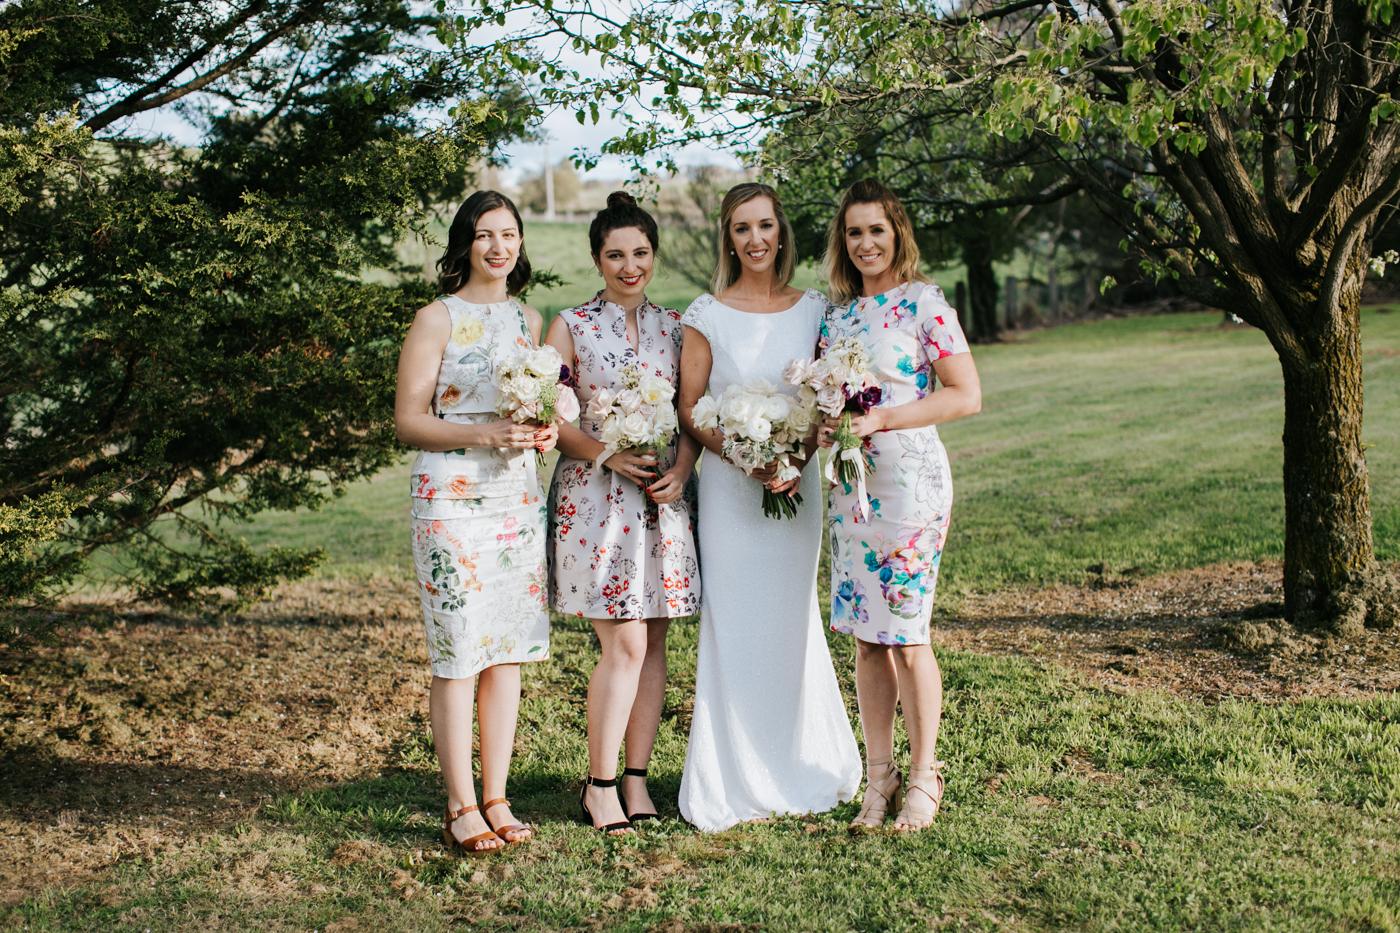 Bridget & James - Orange Country Wedding - Samantha Heather Photography-106.jpg